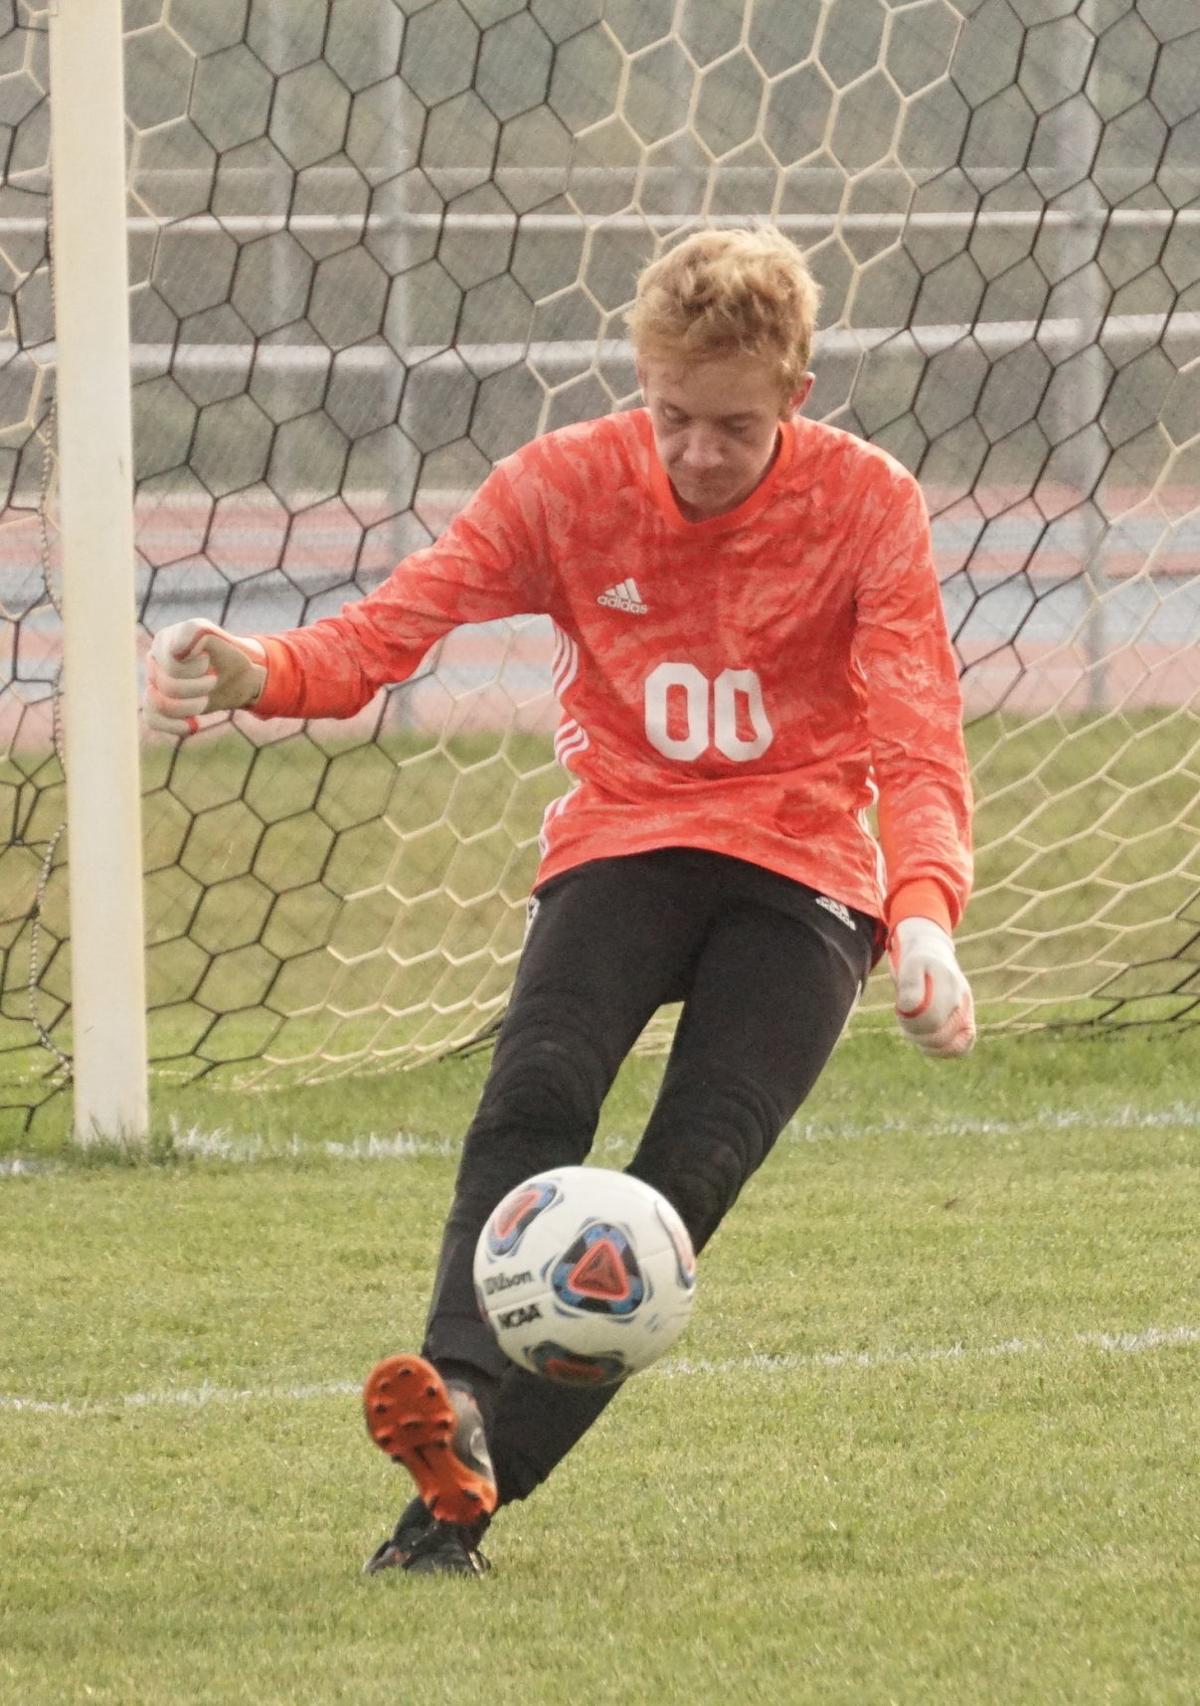 Dreibelbis drives goal kick